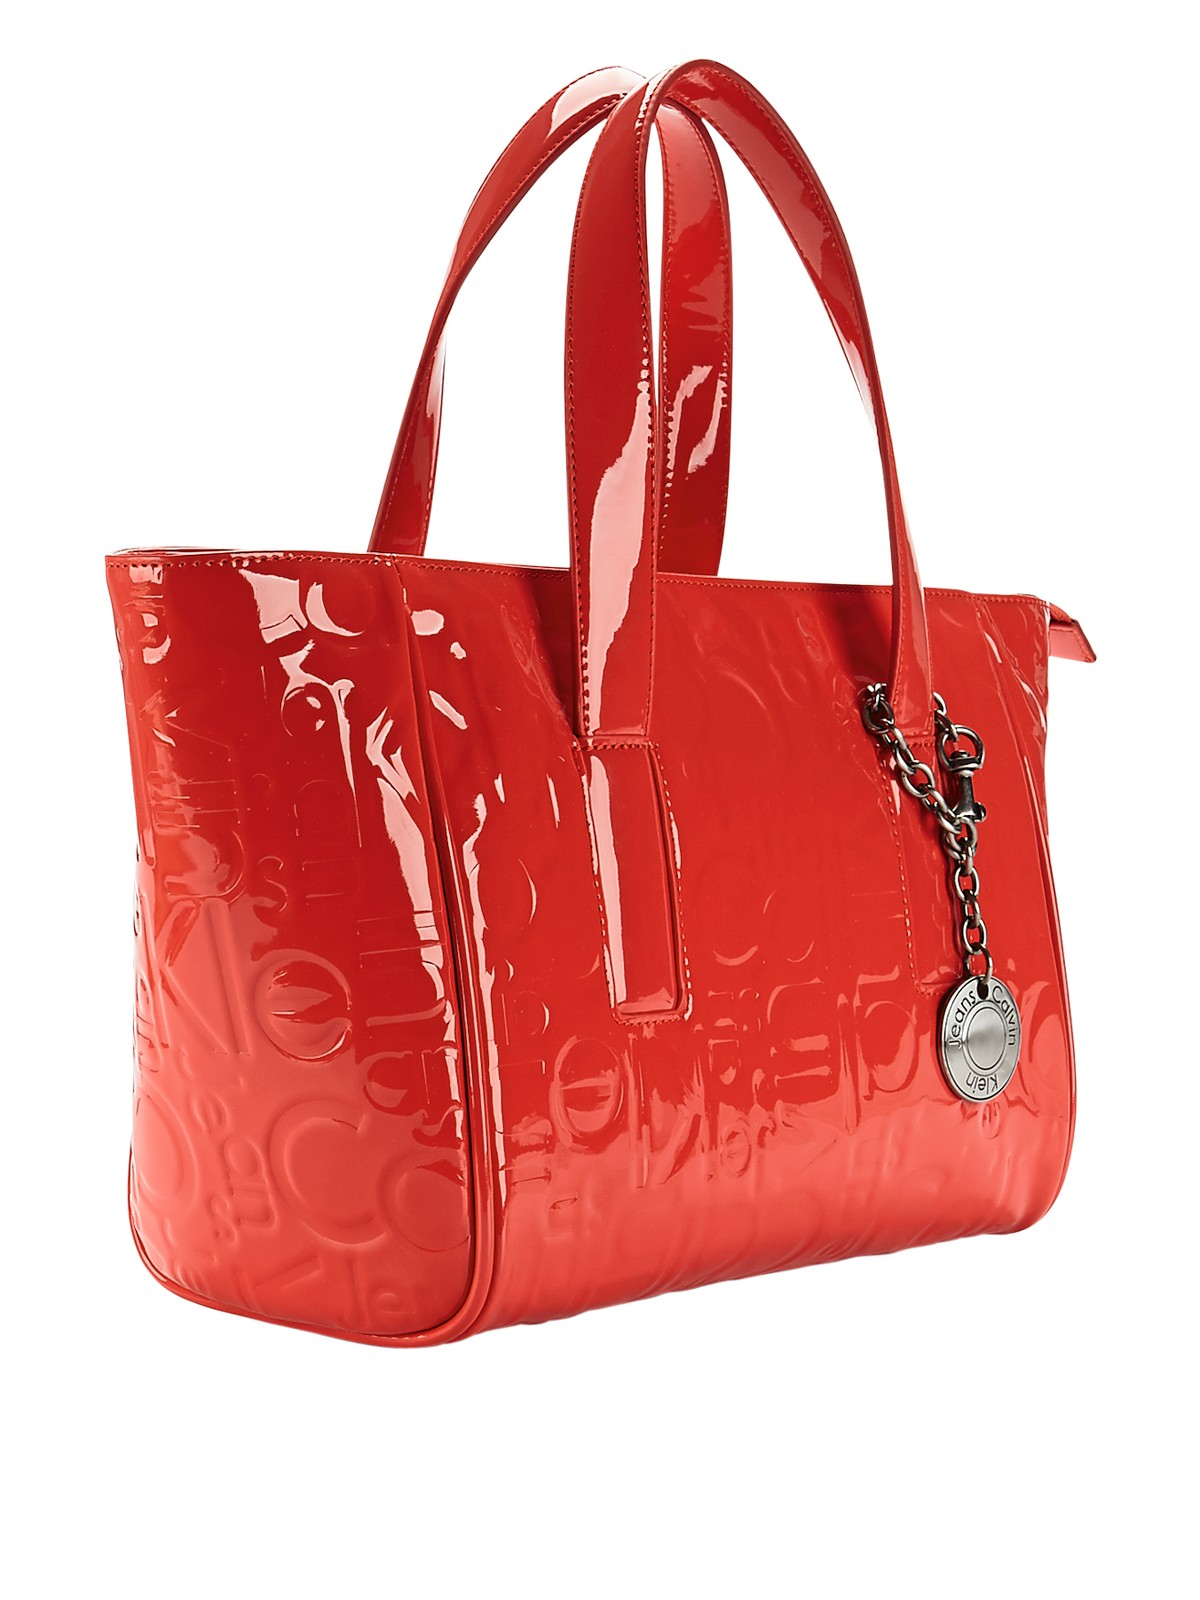 calvin klein patent logo shopper bag in red coral lyst. Black Bedroom Furniture Sets. Home Design Ideas